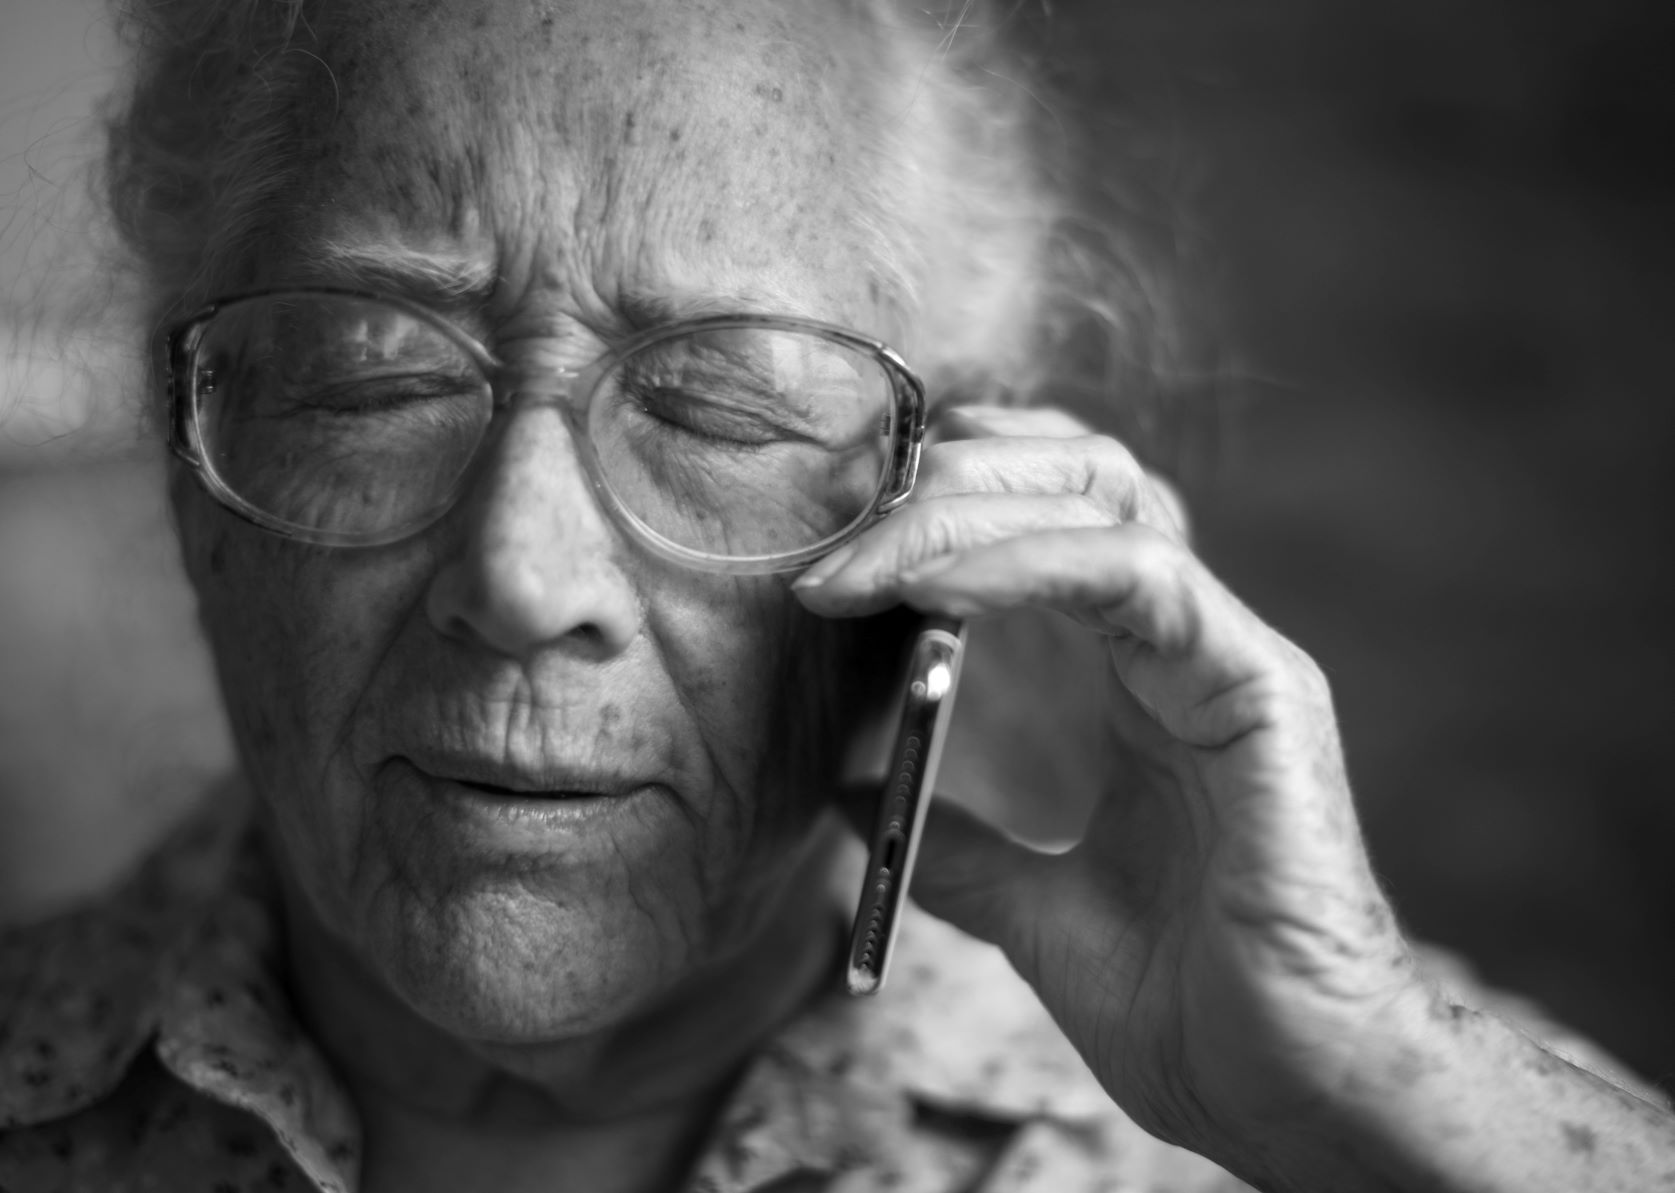 Elderly man on phone call